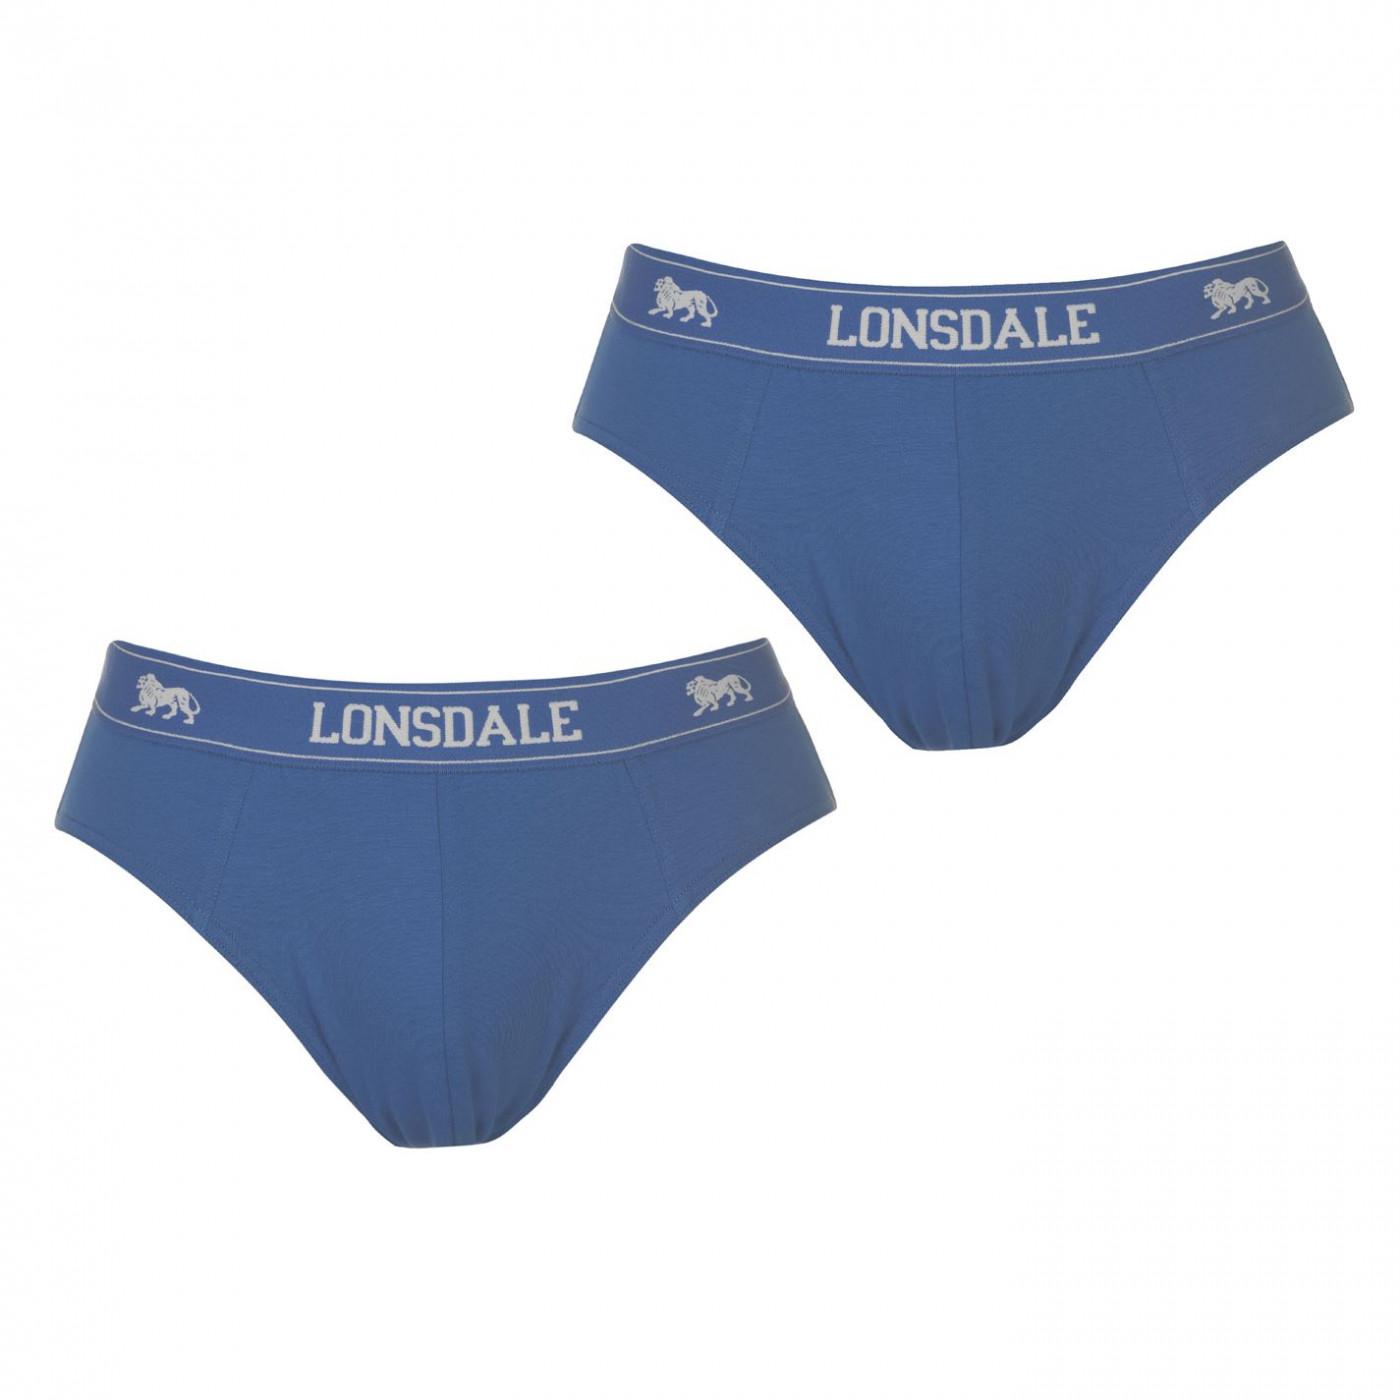 Lonsdale 2Pk Brief Mens